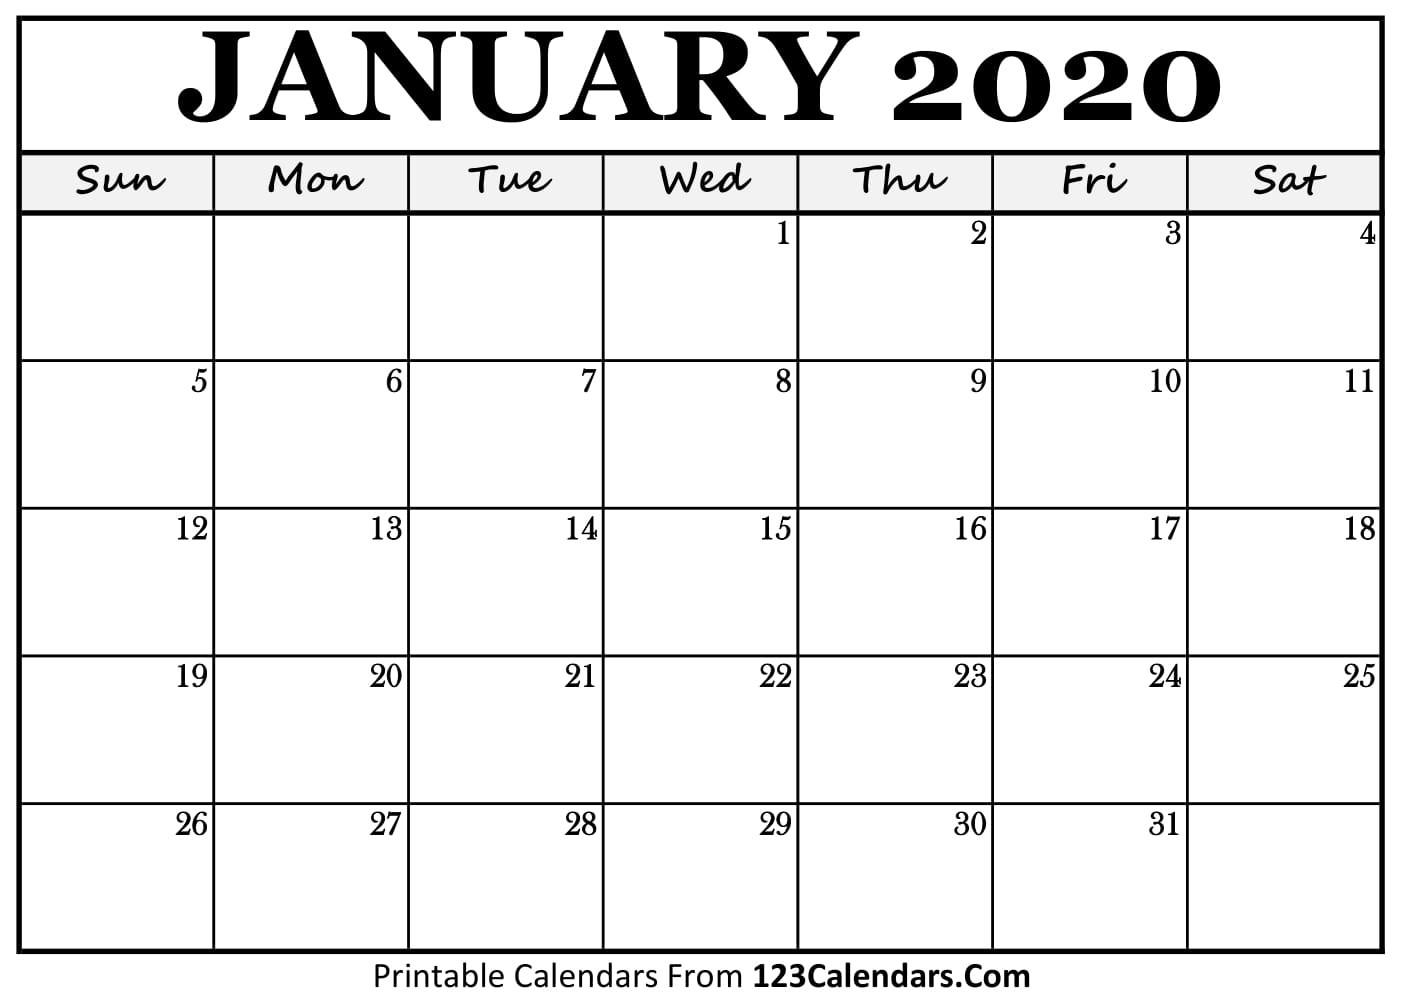 Free Printable Calendar | 123Calendars  Calendar 2020 Free Printable